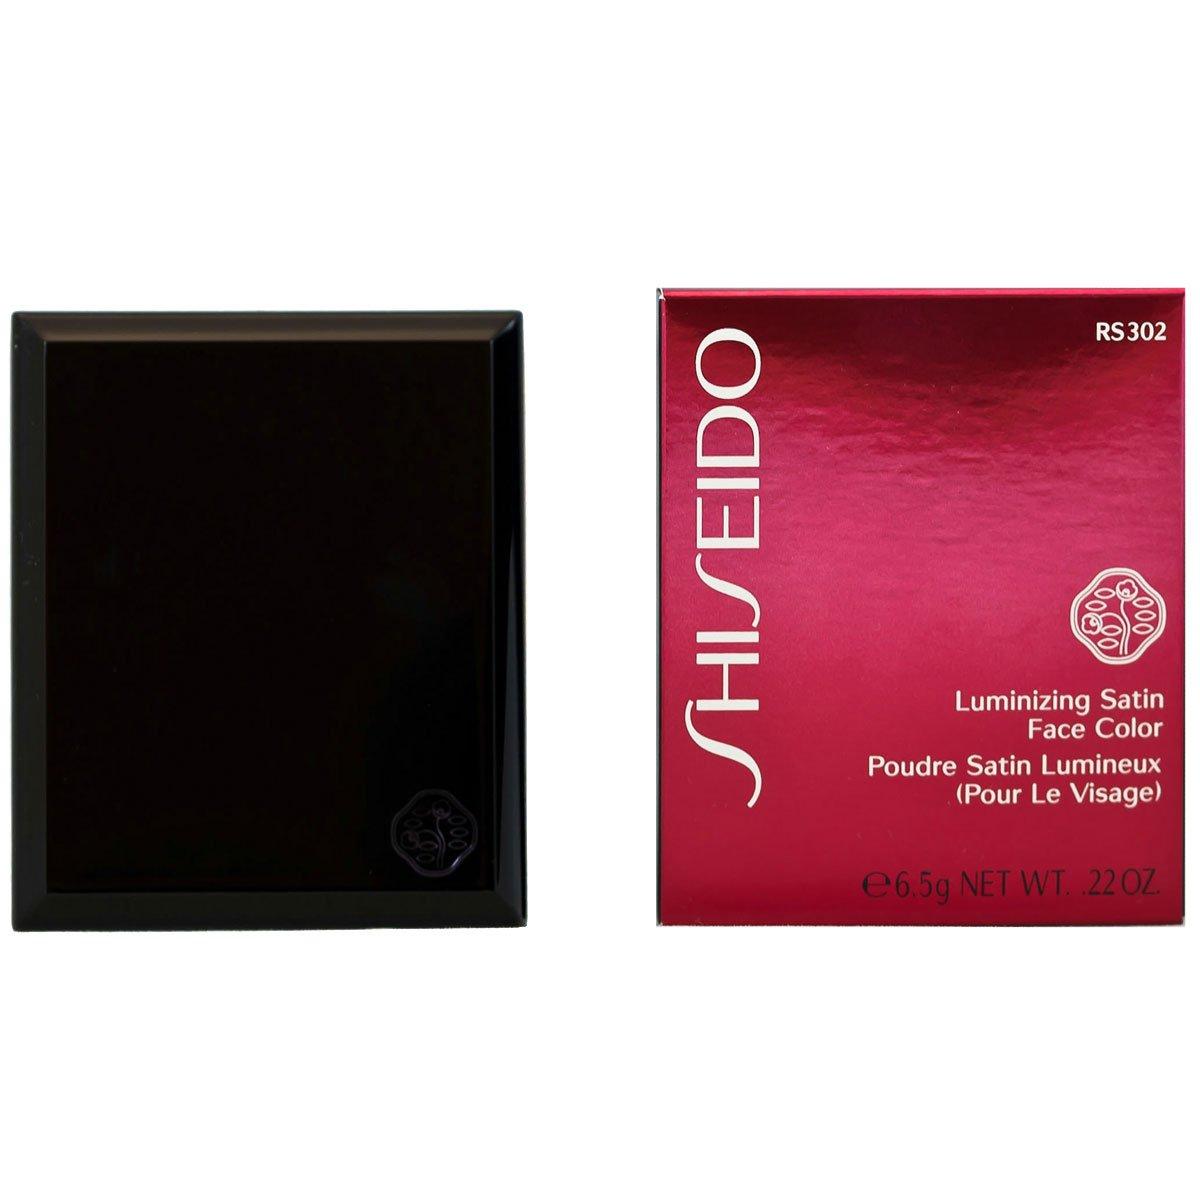 Shiseido Luminizing Satin Face Color, No. Rs302 Tea, 6.5 Ounce